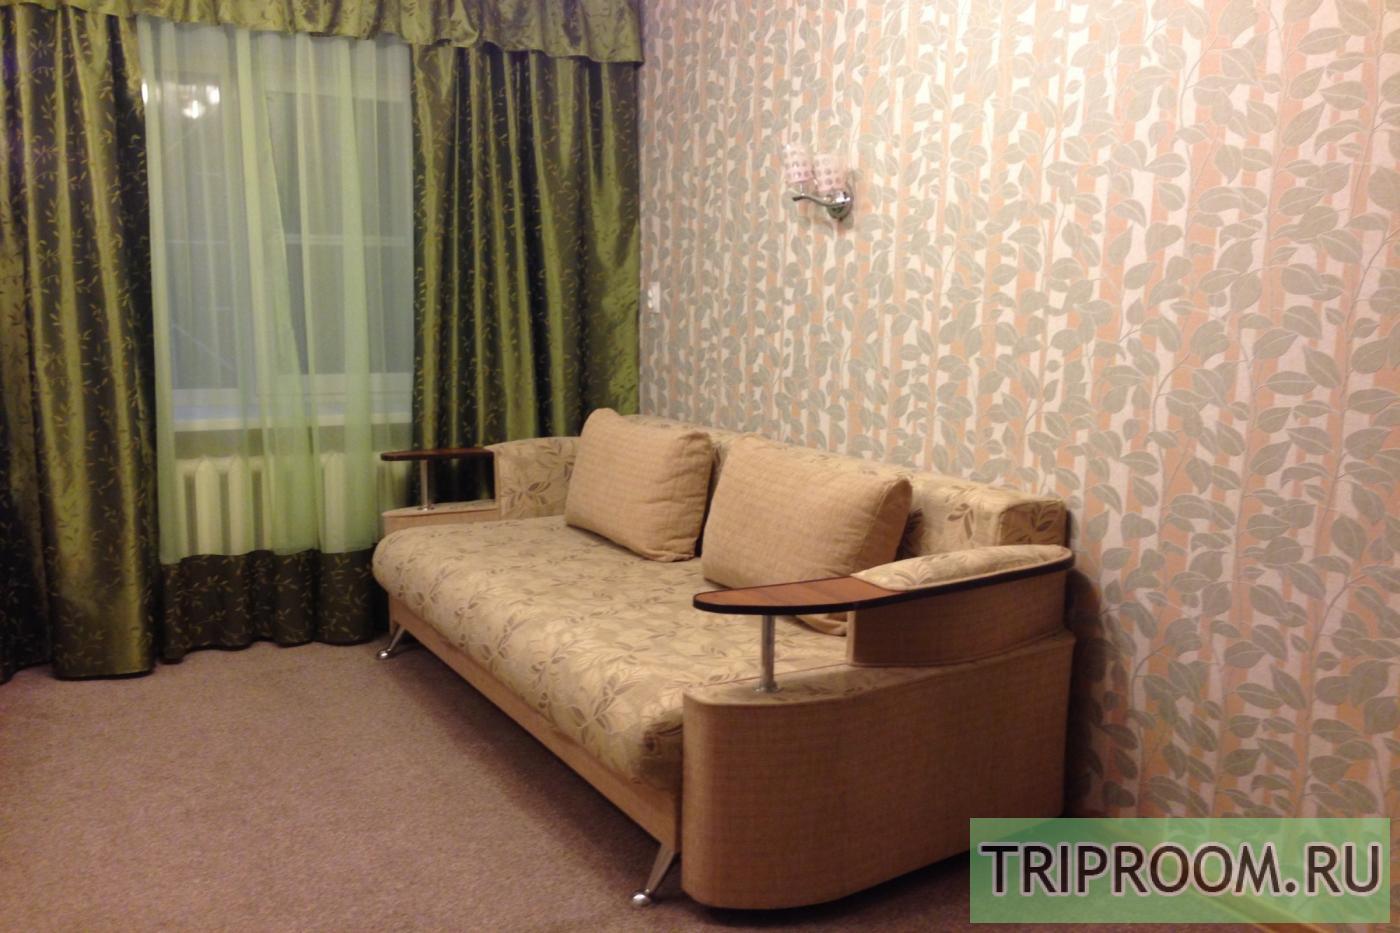 2-комнатная квартира посуточно (вариант № 20611), ул. Титова улица, фото № 3